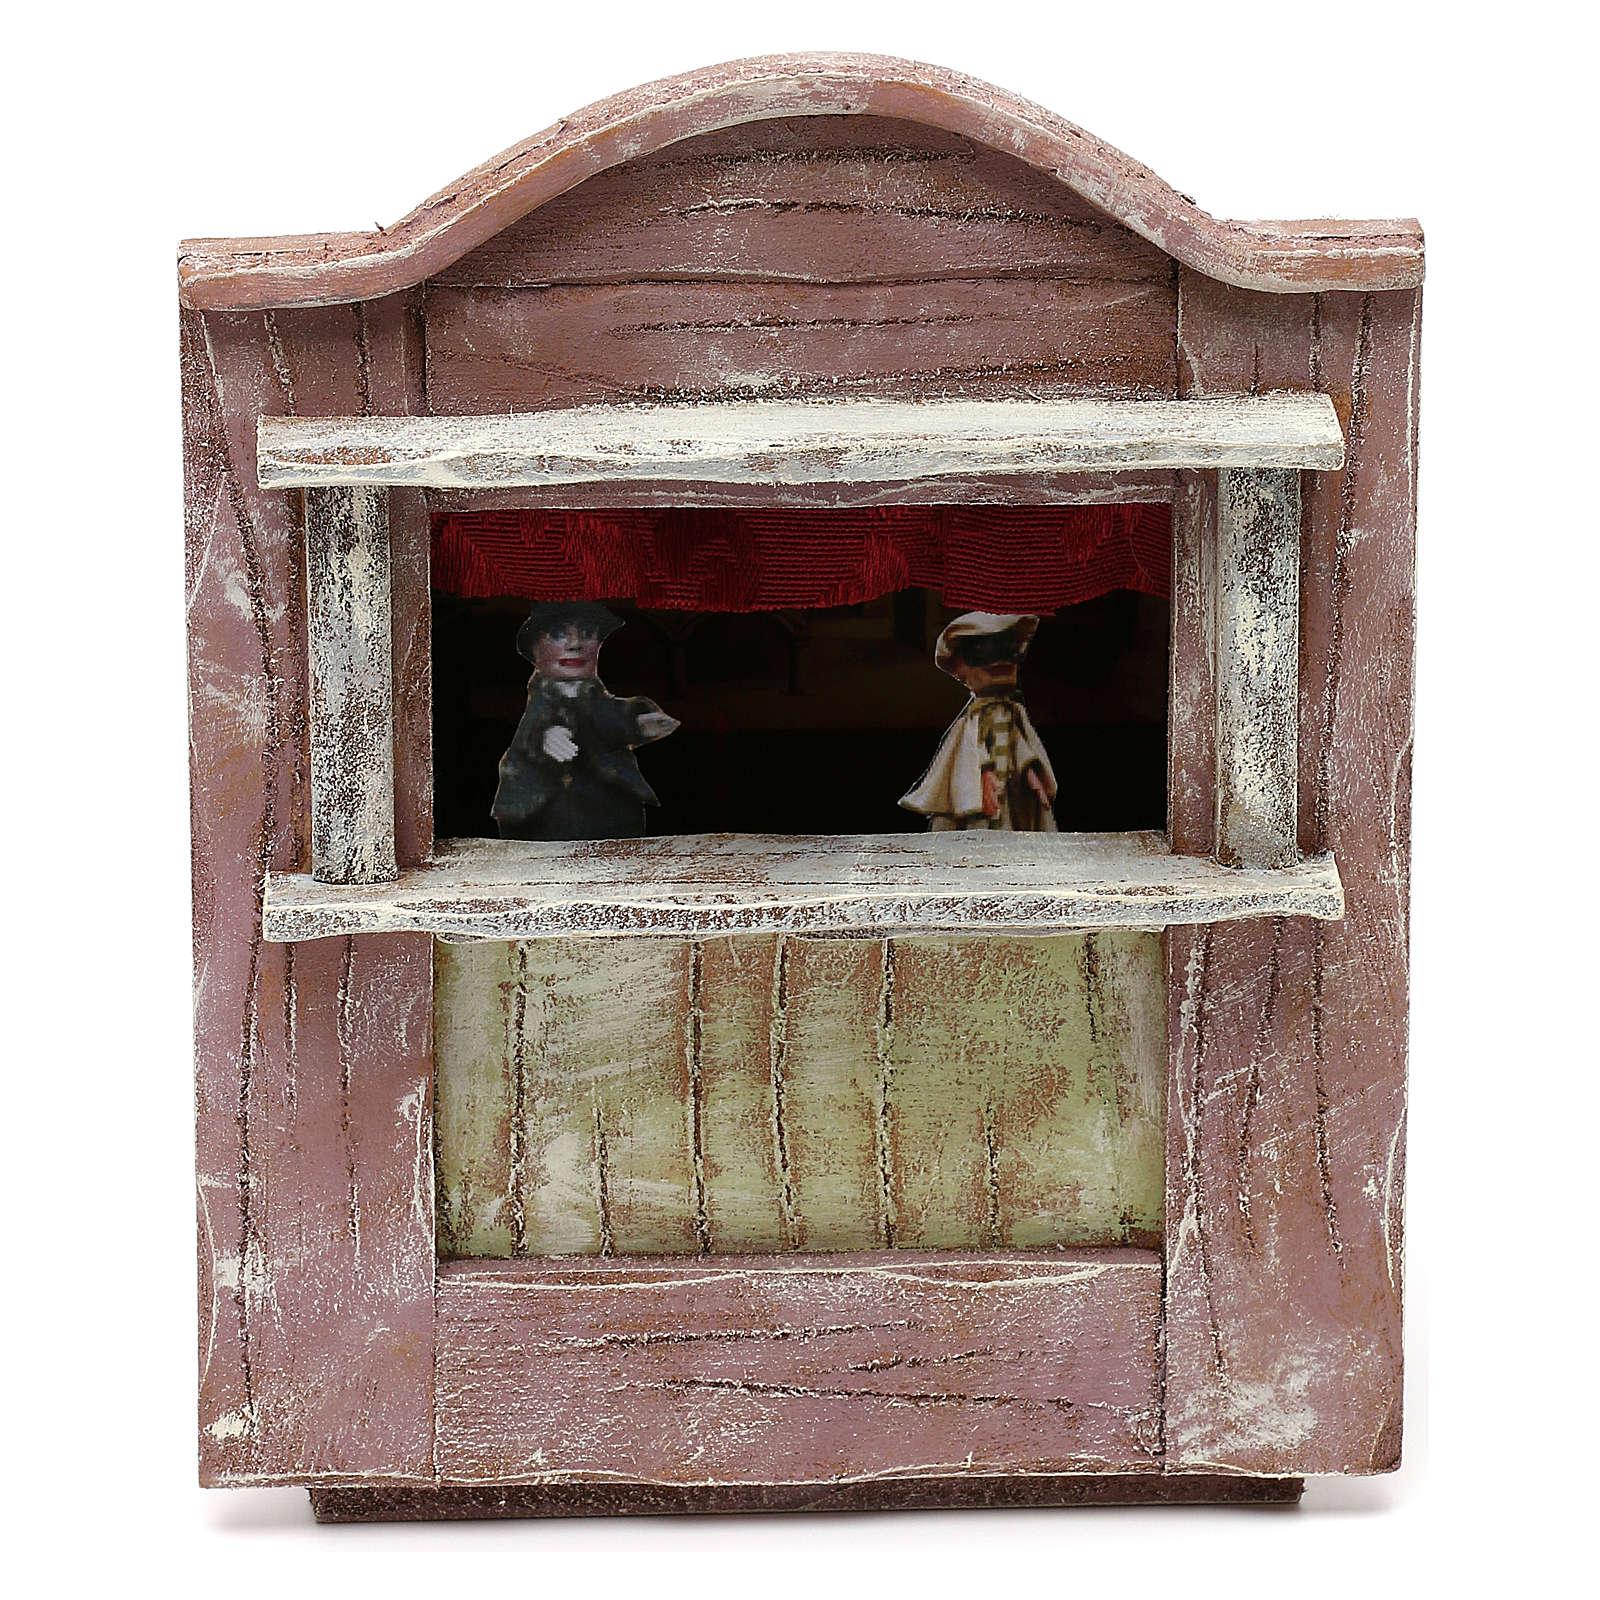 Teatrino marionette legno presepe 10 cm 20x15x10 cm 4